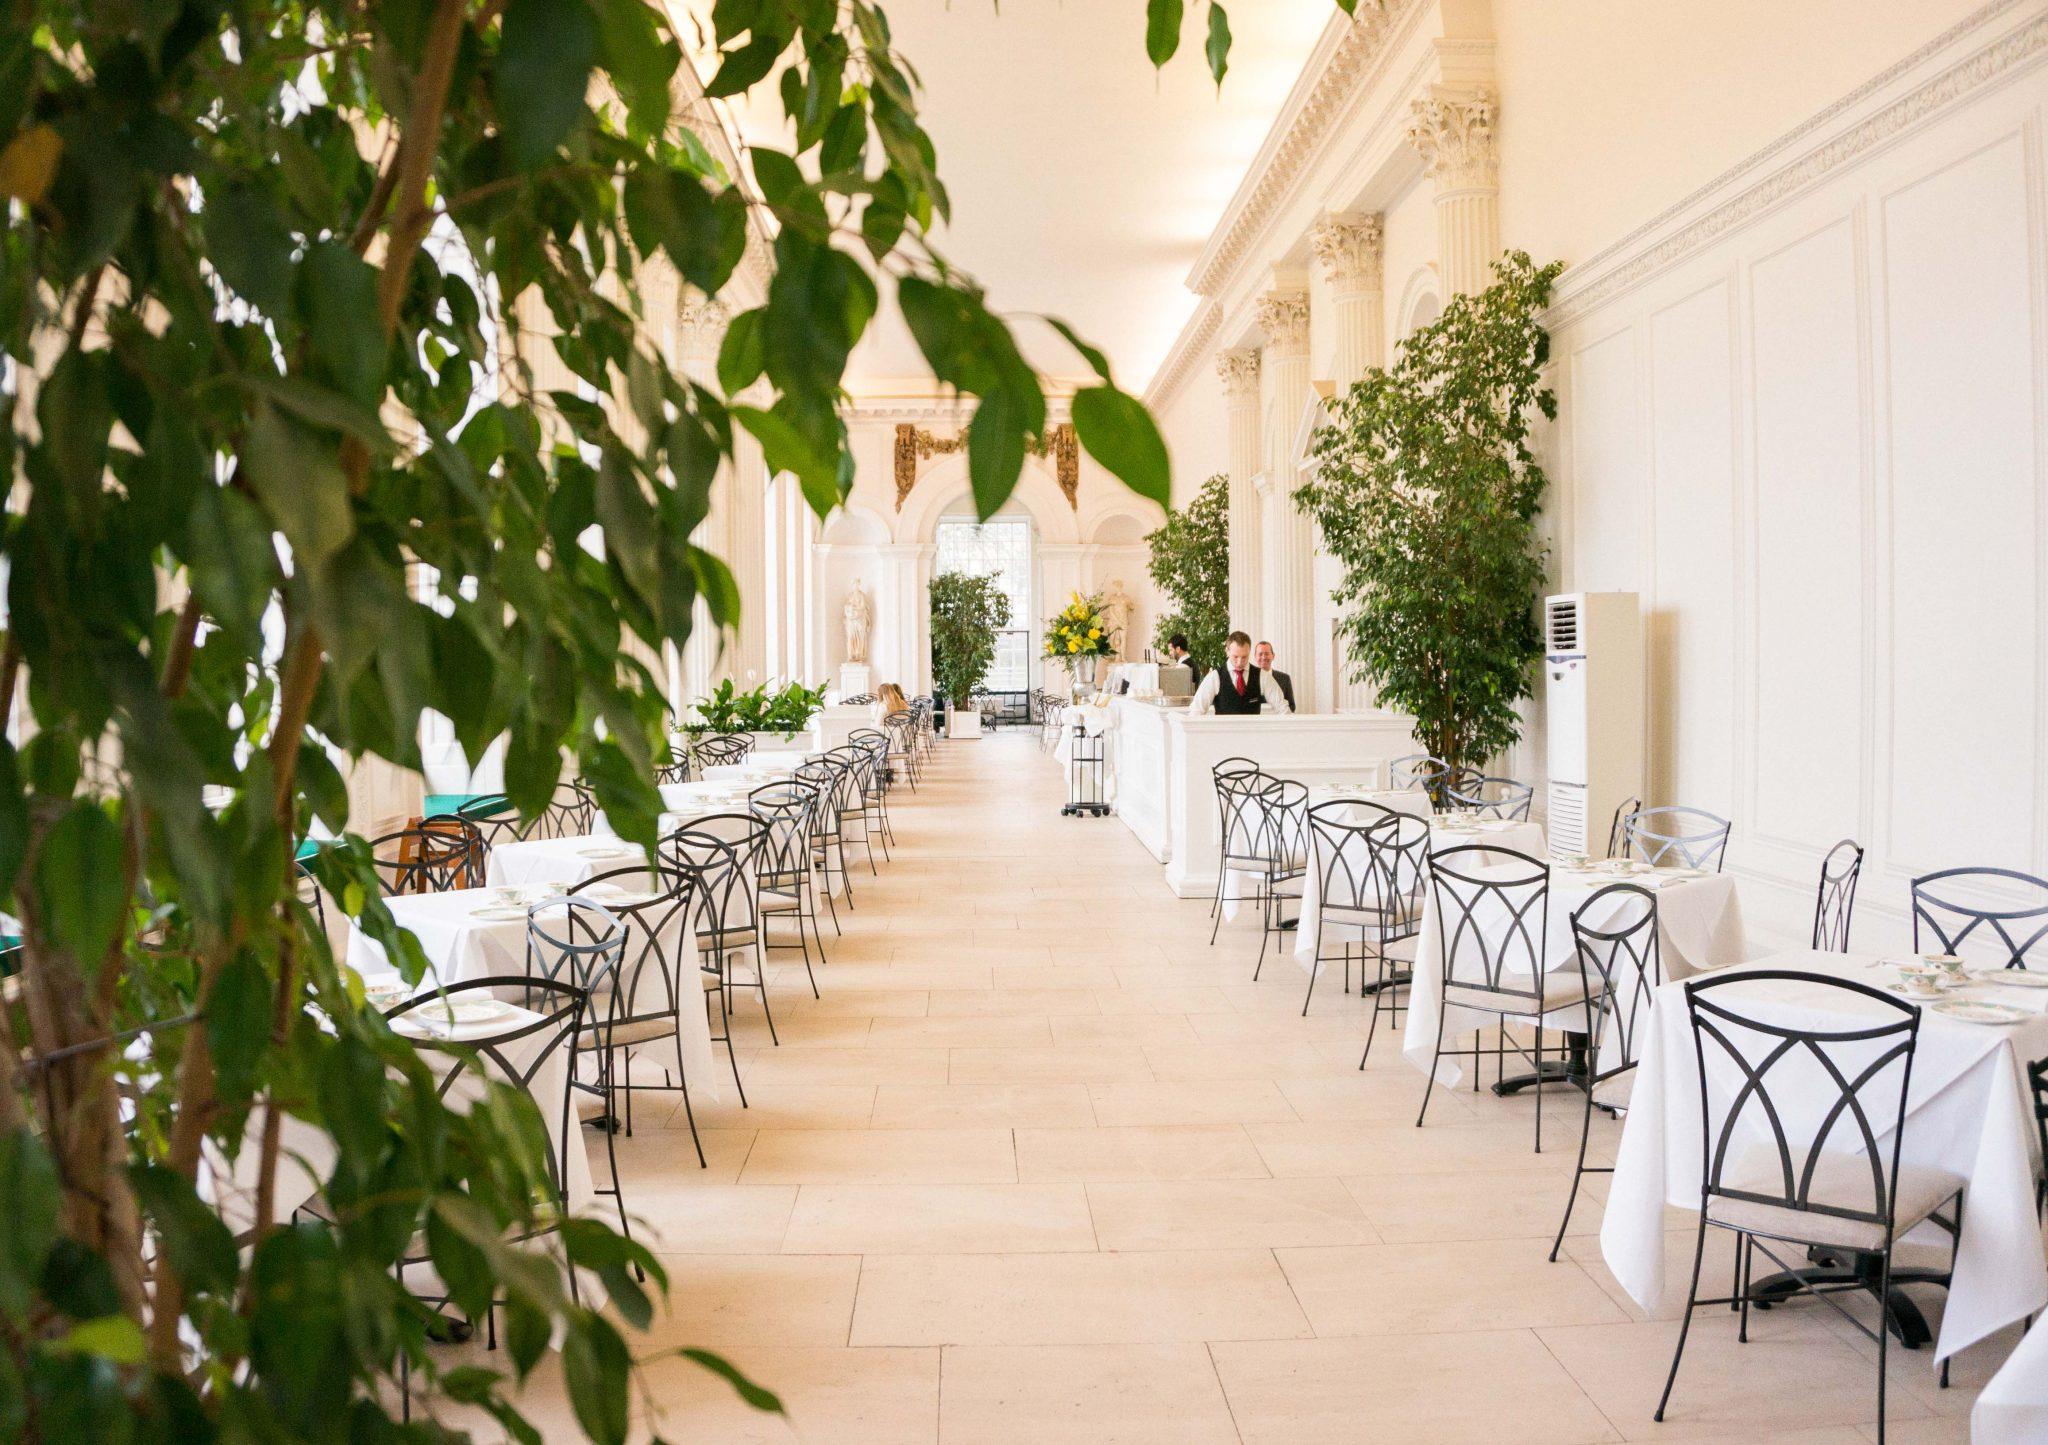 The_Orangery_Kensington_Palace